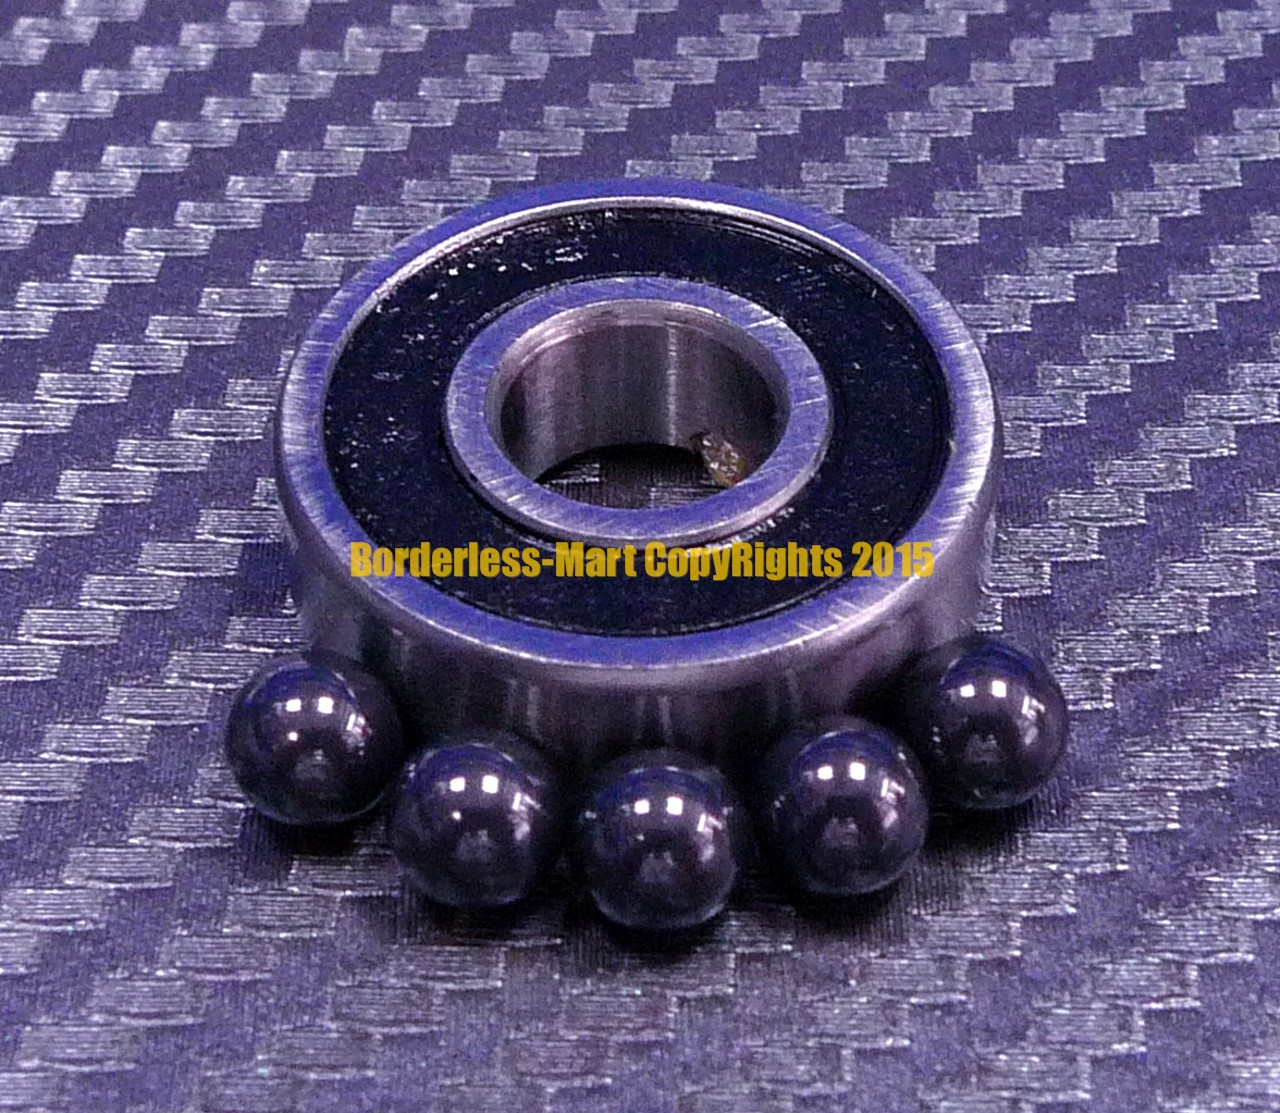 F688-2RS Metal Flanged Rubber Sealed Ball Bearing Bearings 8x16x5 mm 20 Pcs